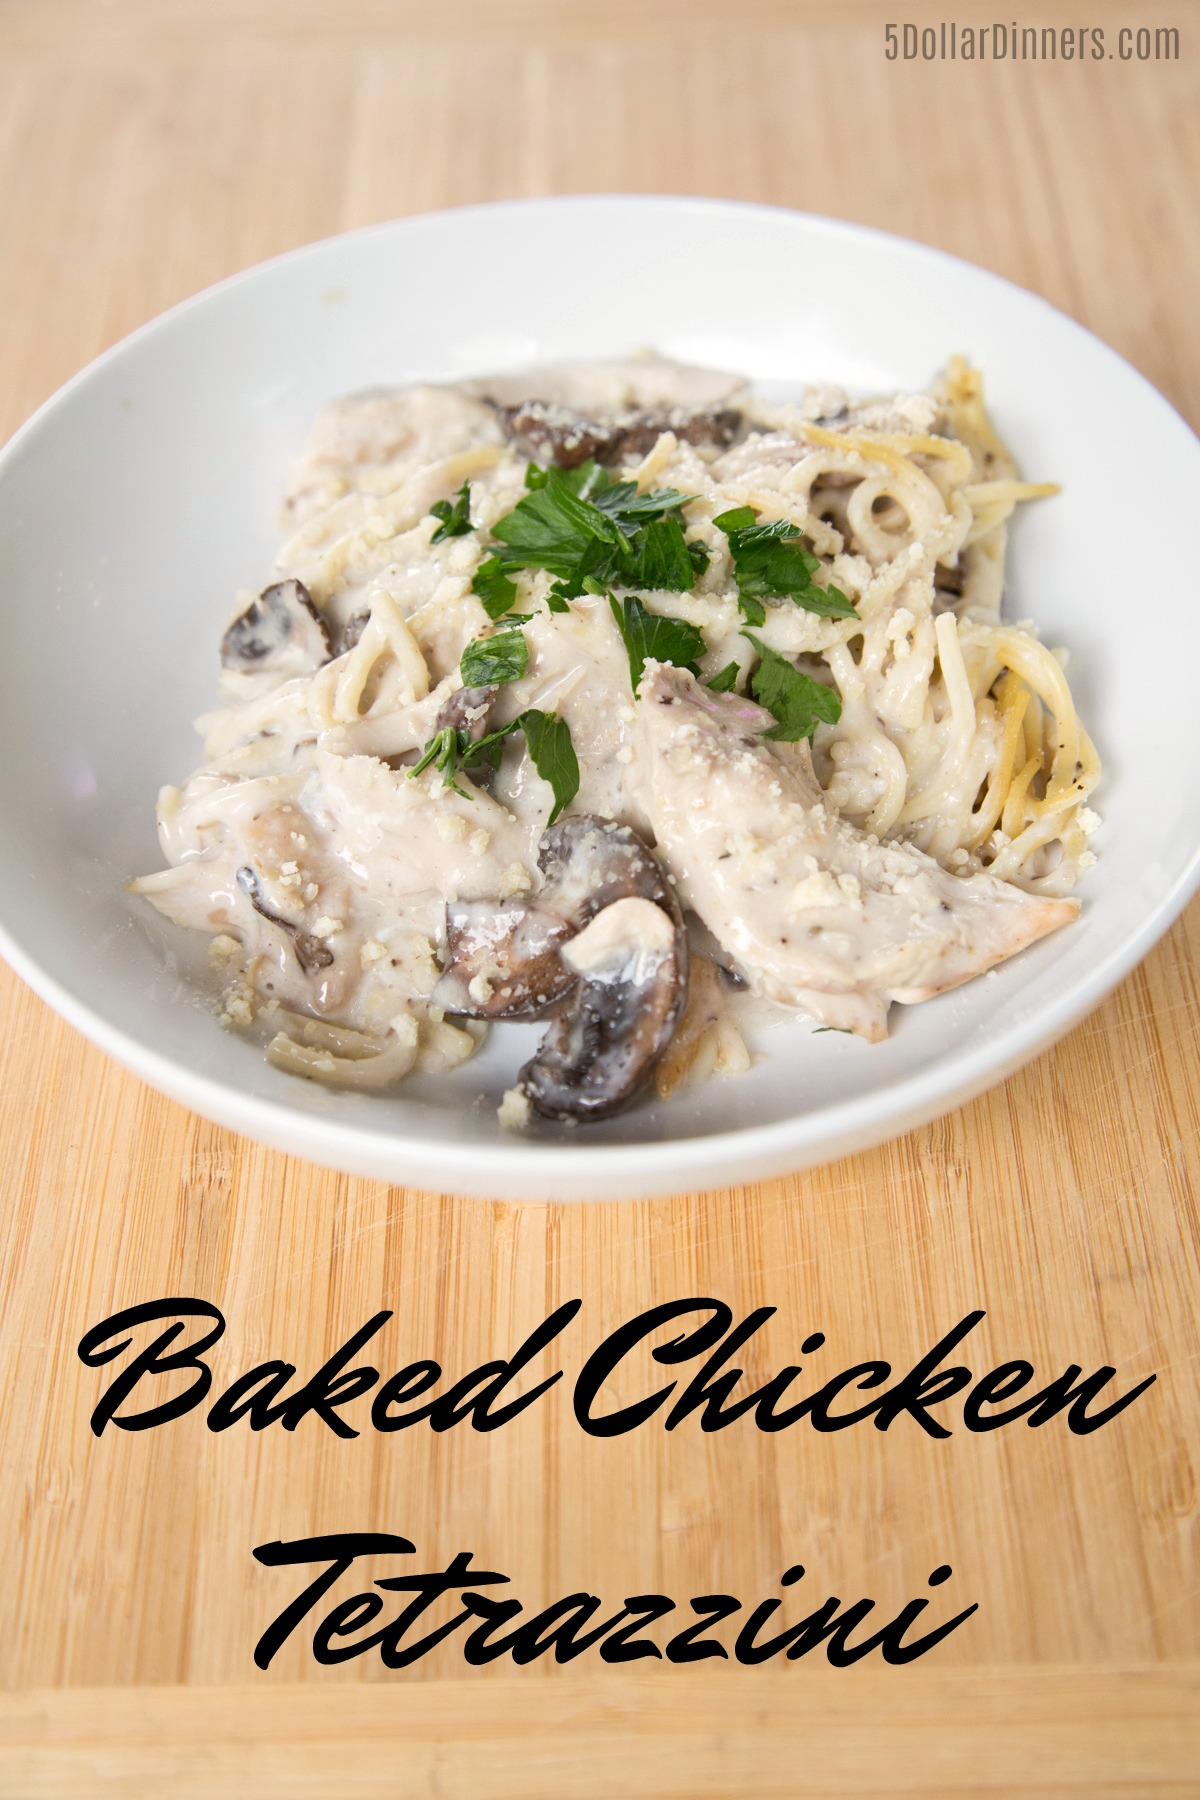 Baked Chicken Tetrazzini